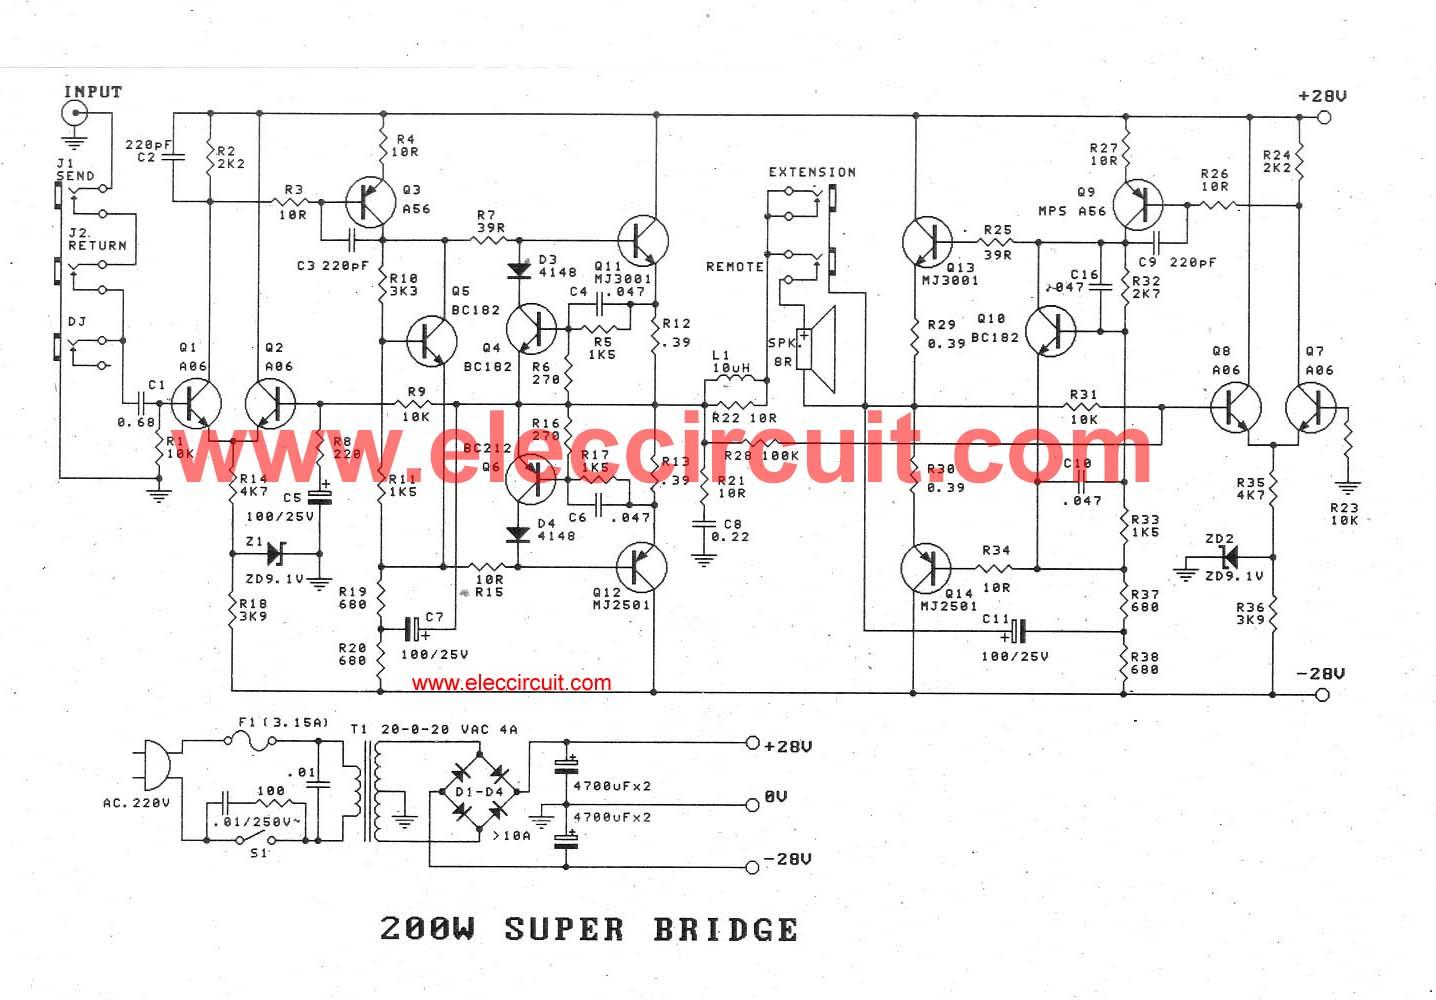 50 Amp 51 Hifi Amplifier 7570743 Power Ocl 100w With Mj802 Mj4502 Electronic Projects Amazoncom Watt